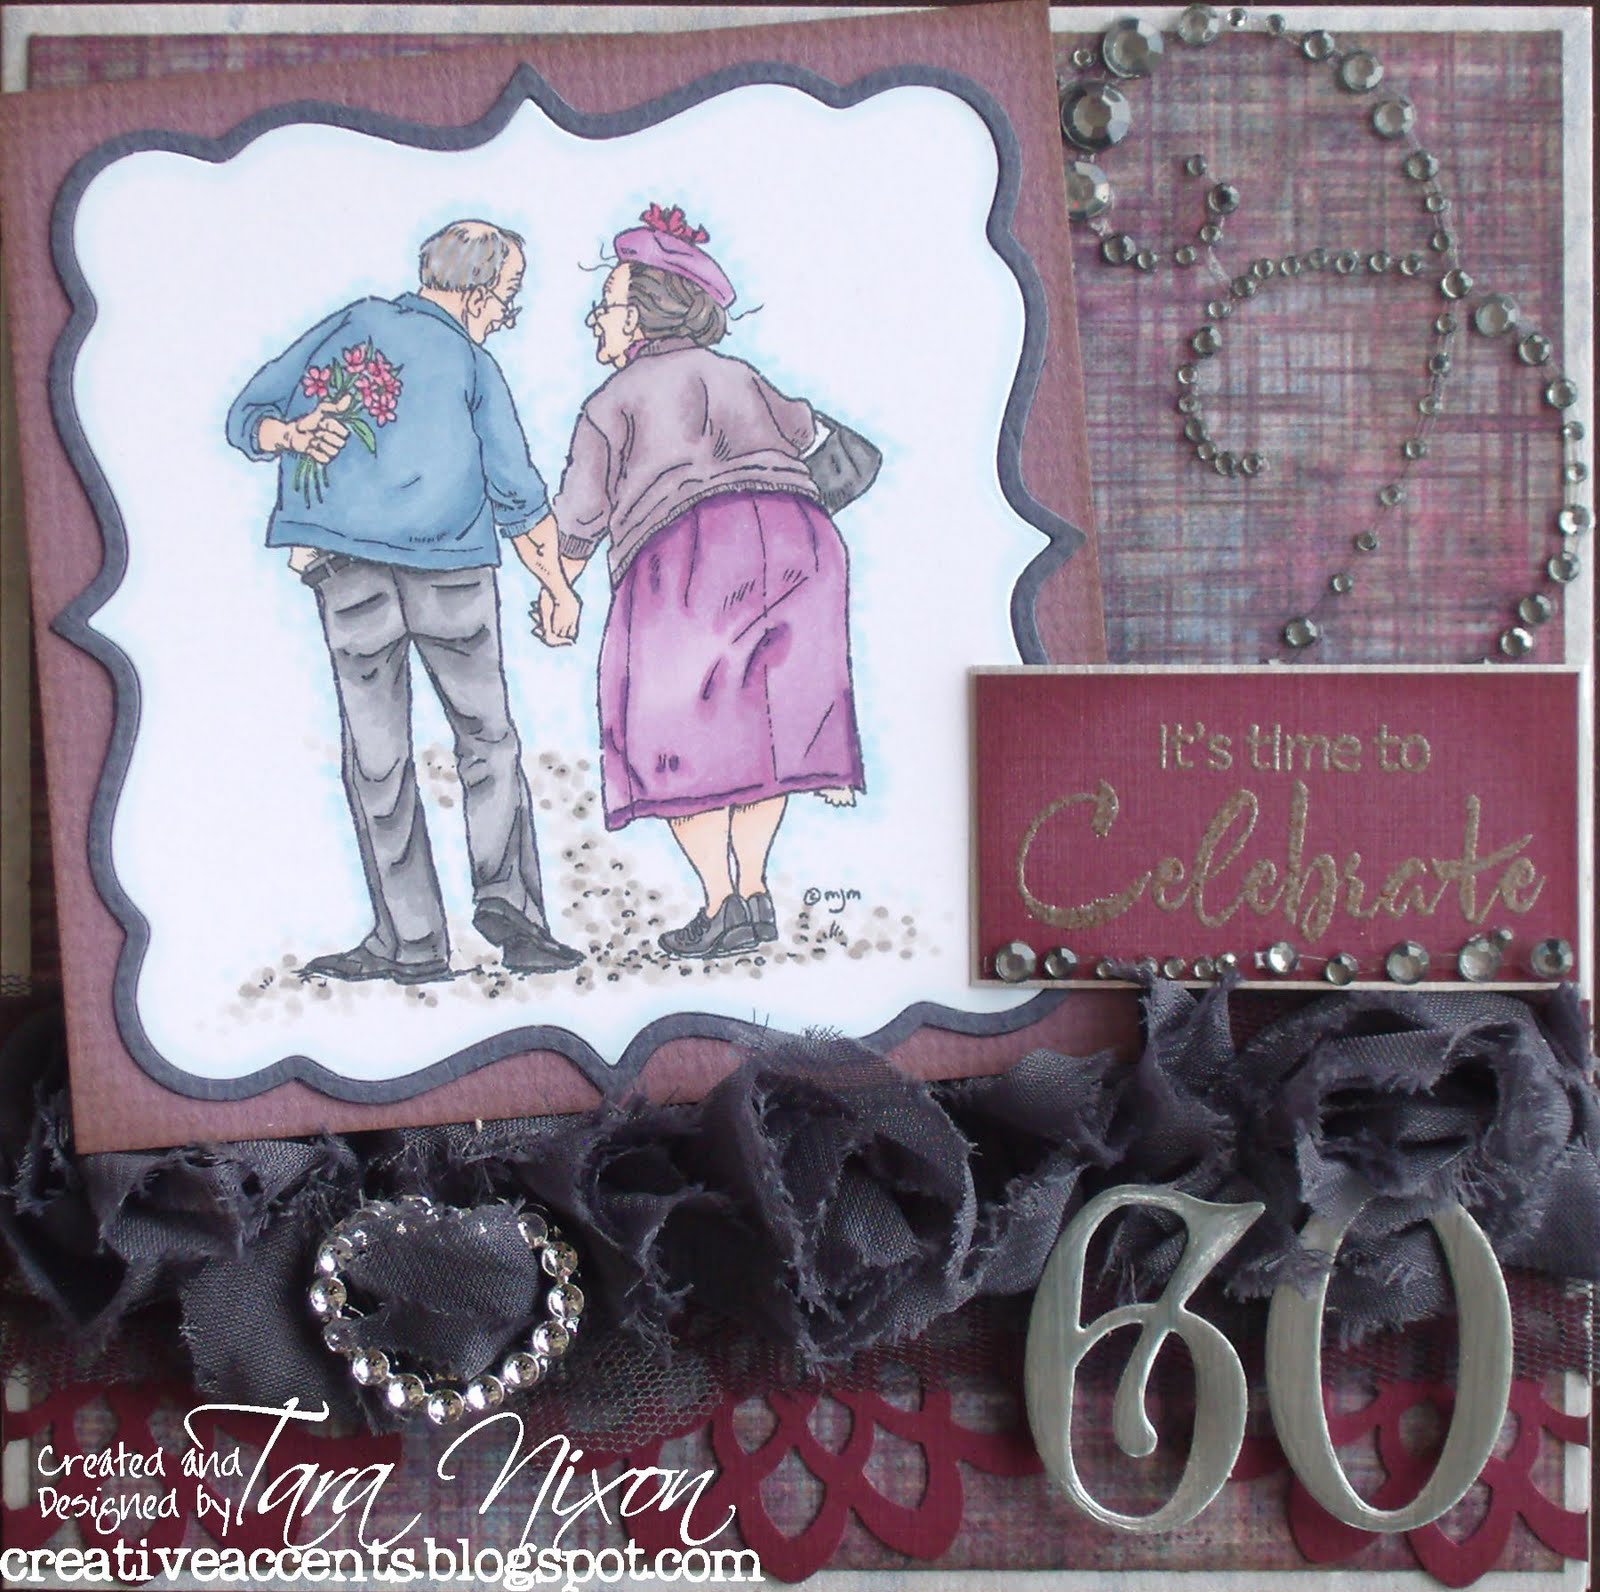 Happy 60th anniversary for 60th wedding anniversary decoration ideas